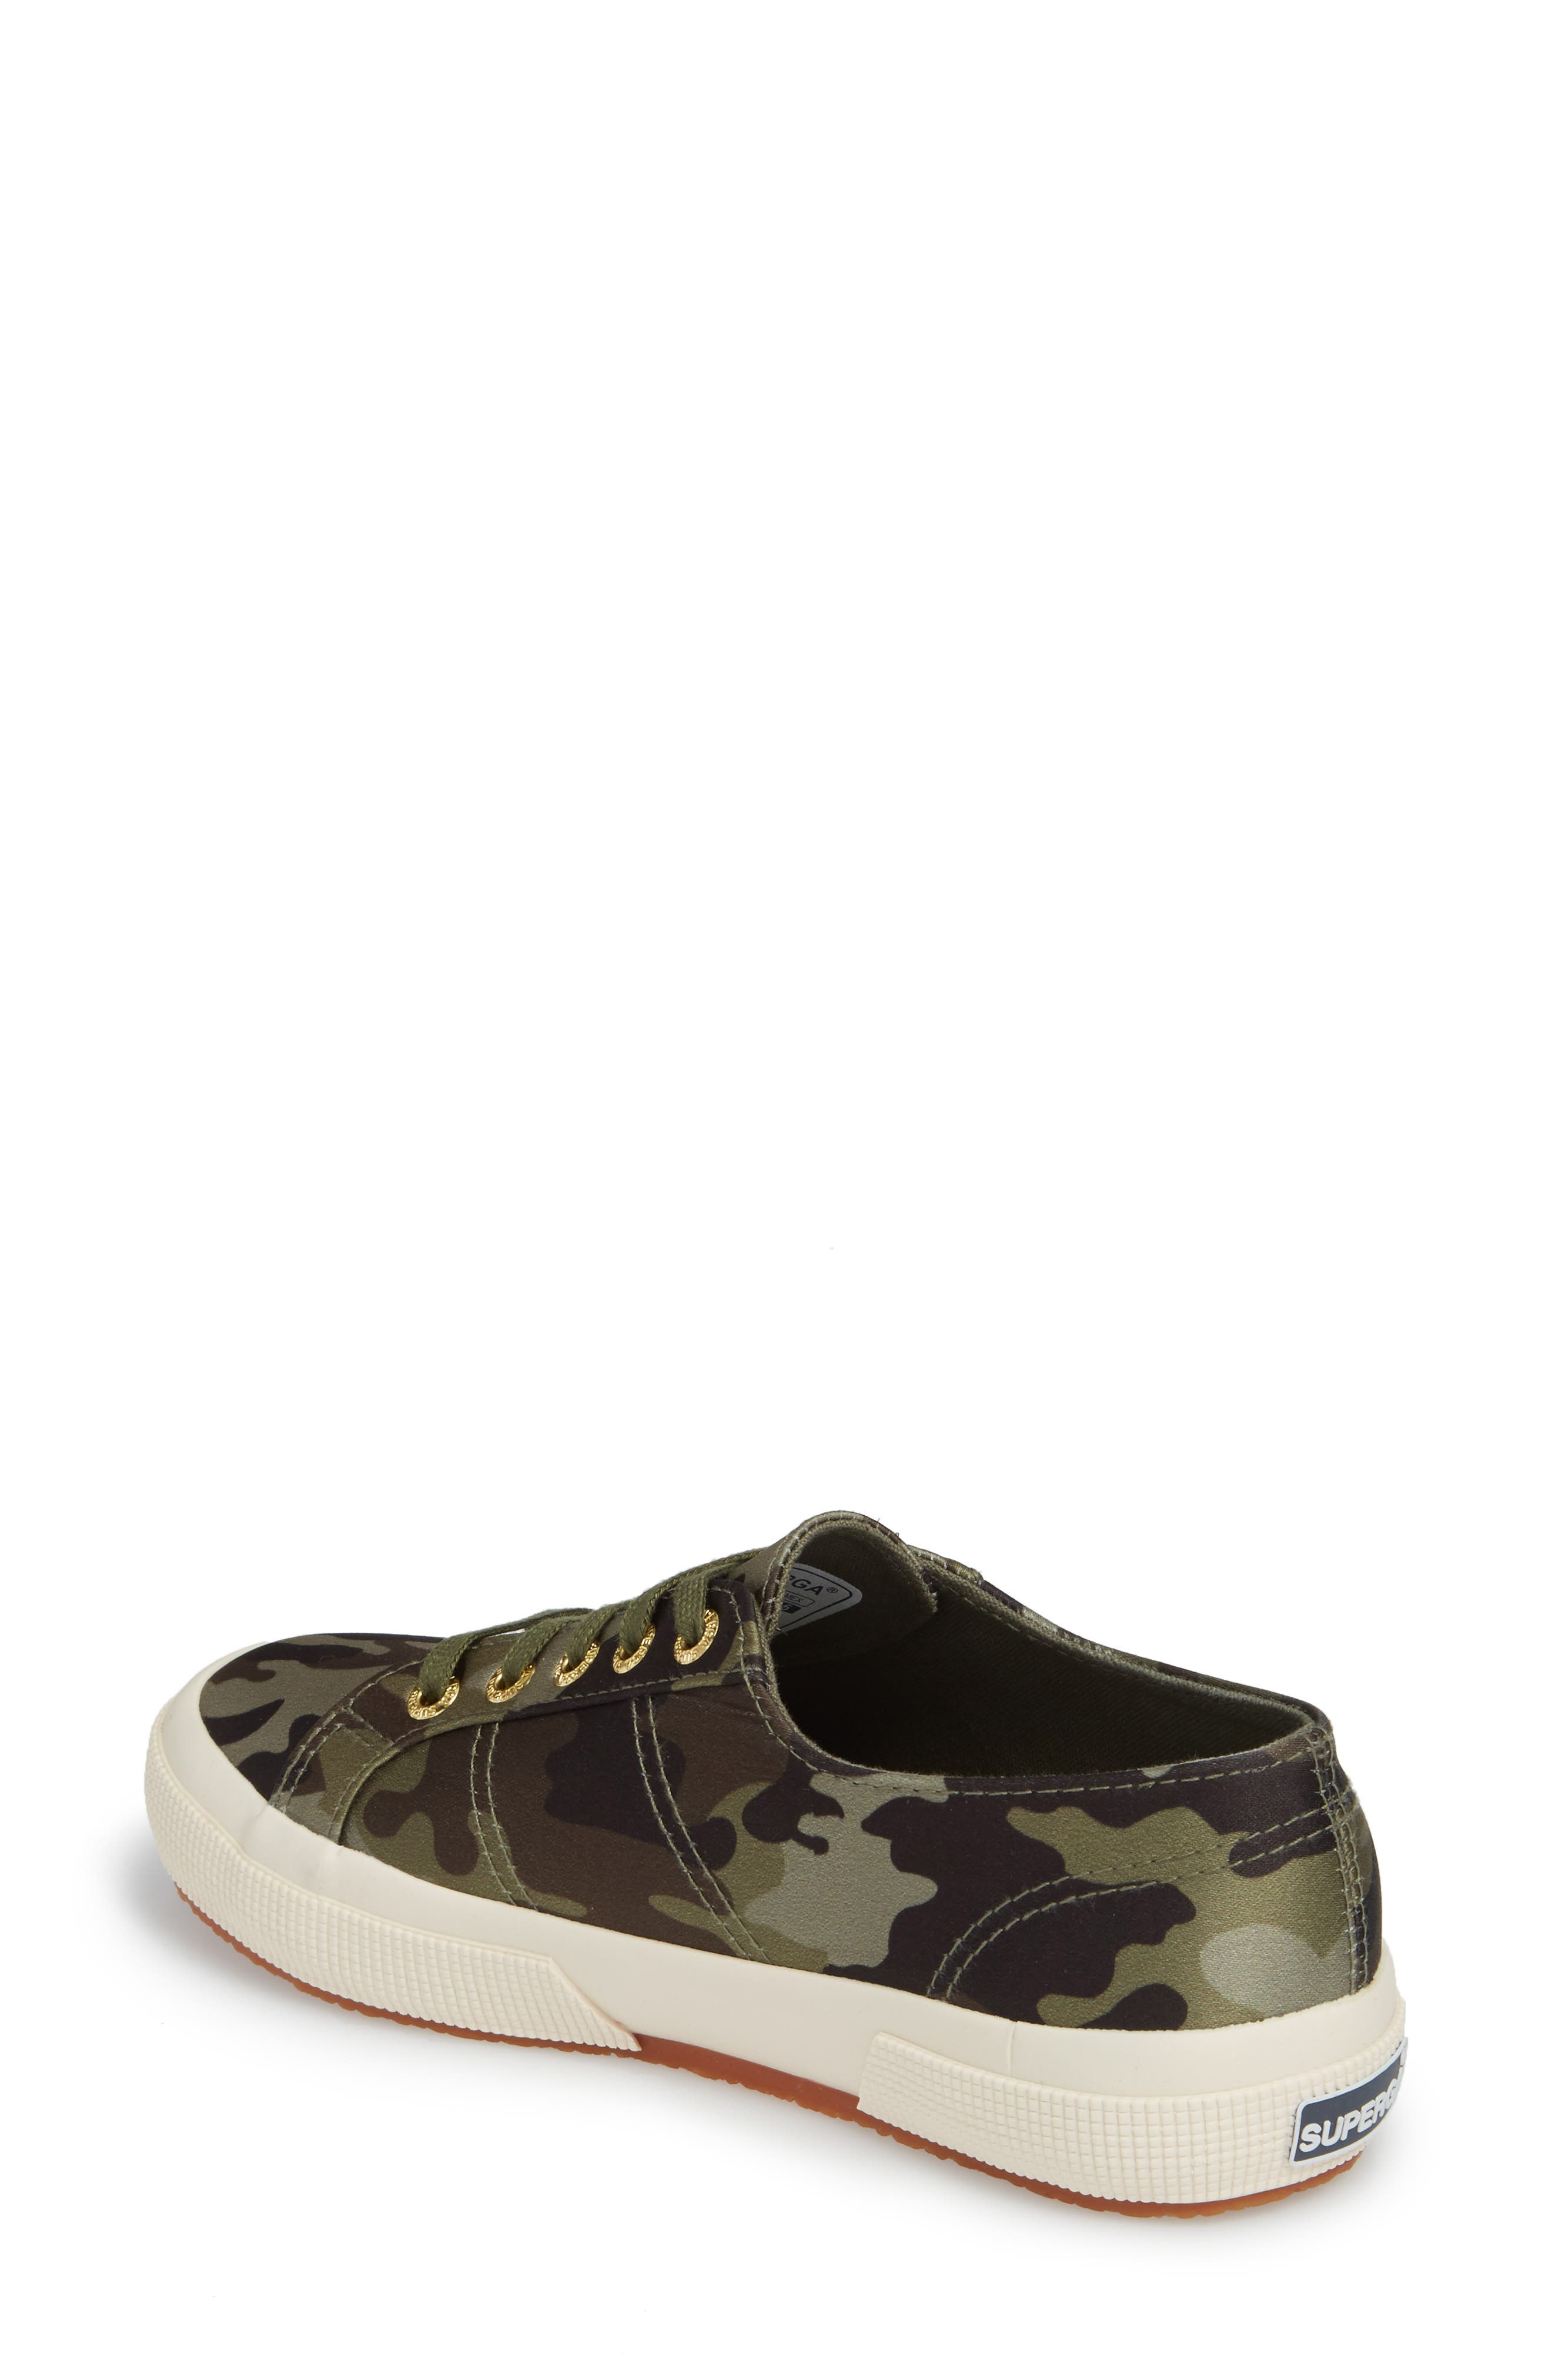 Alternate Image 2  - Superga 2750 Sneaker (Women)